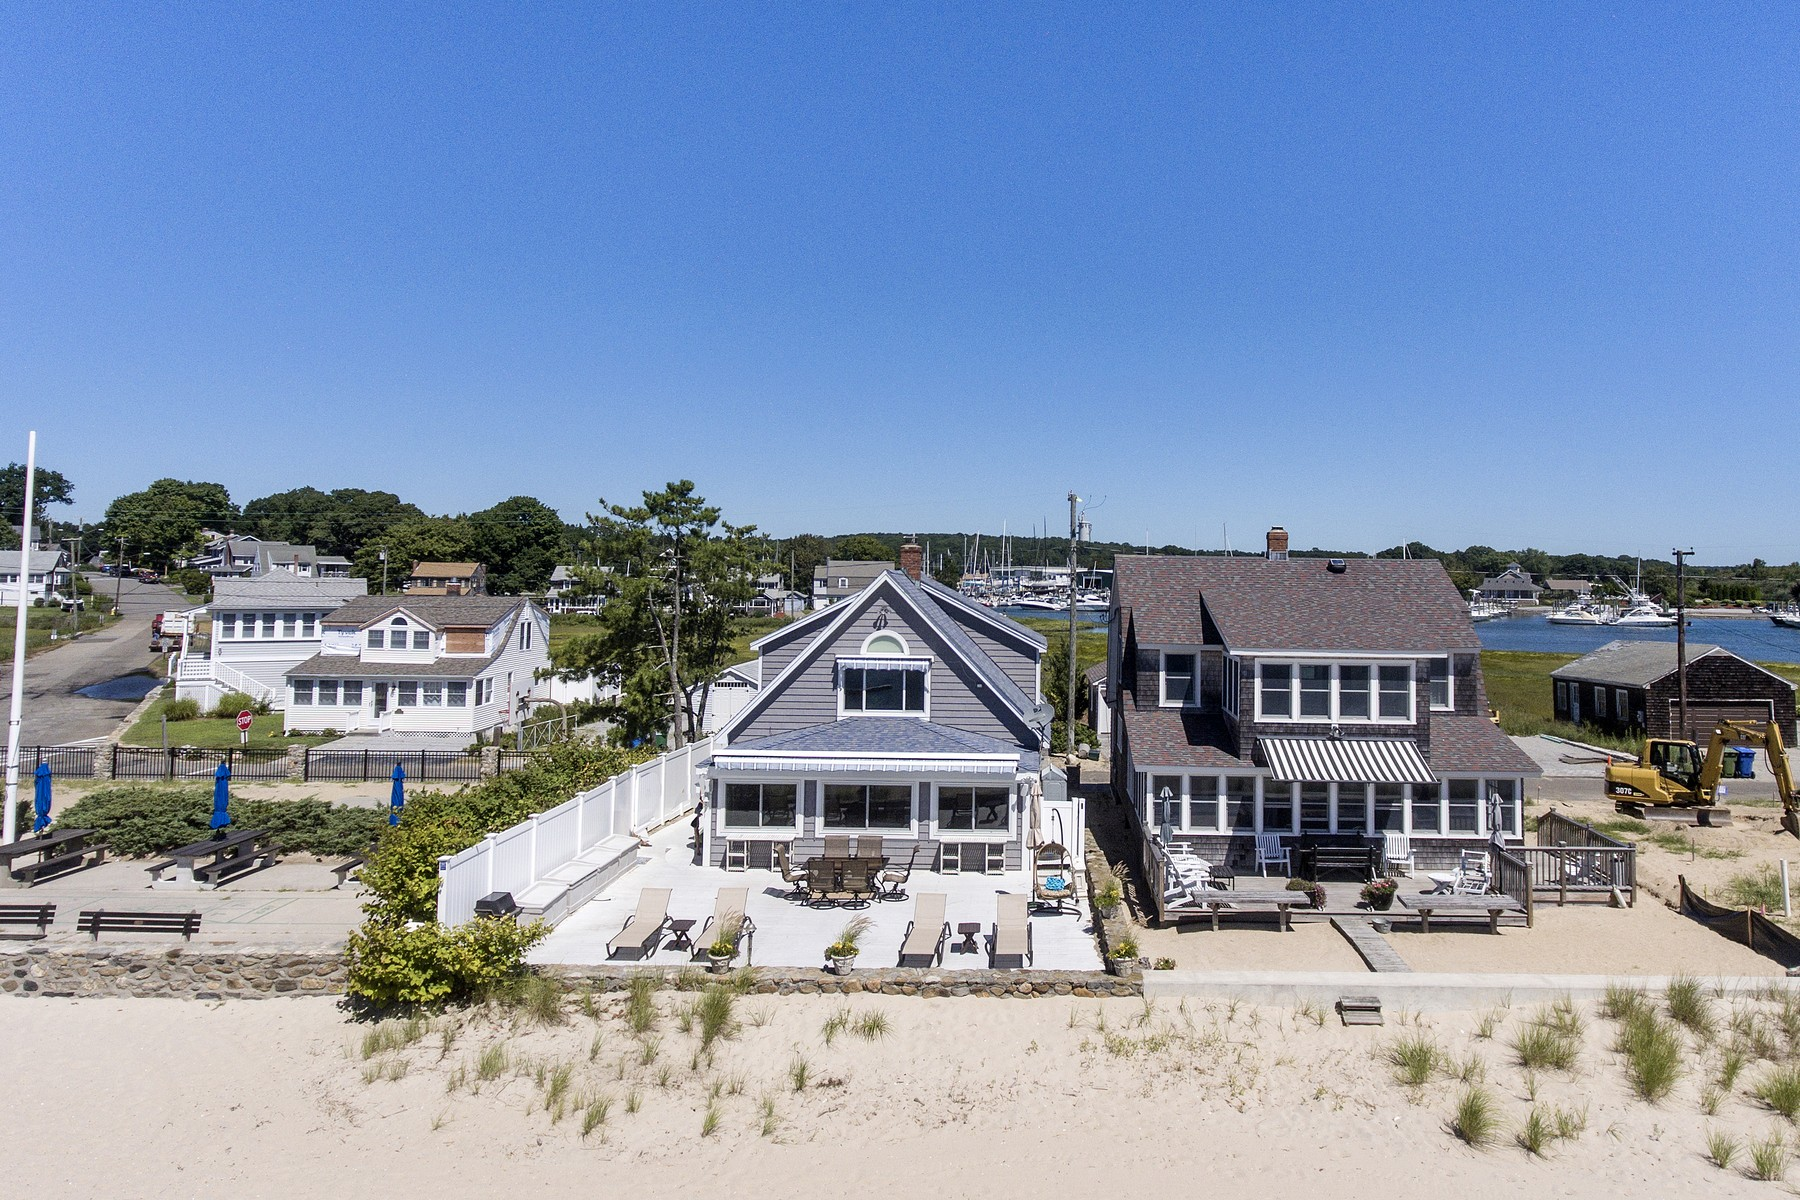 Nhà ở một gia đình vì Bán tại A True Beach Home, Just one Step to The Sand 105 Old Mail Trail Westbrook, Connecticut, 06498 Hoa Kỳ